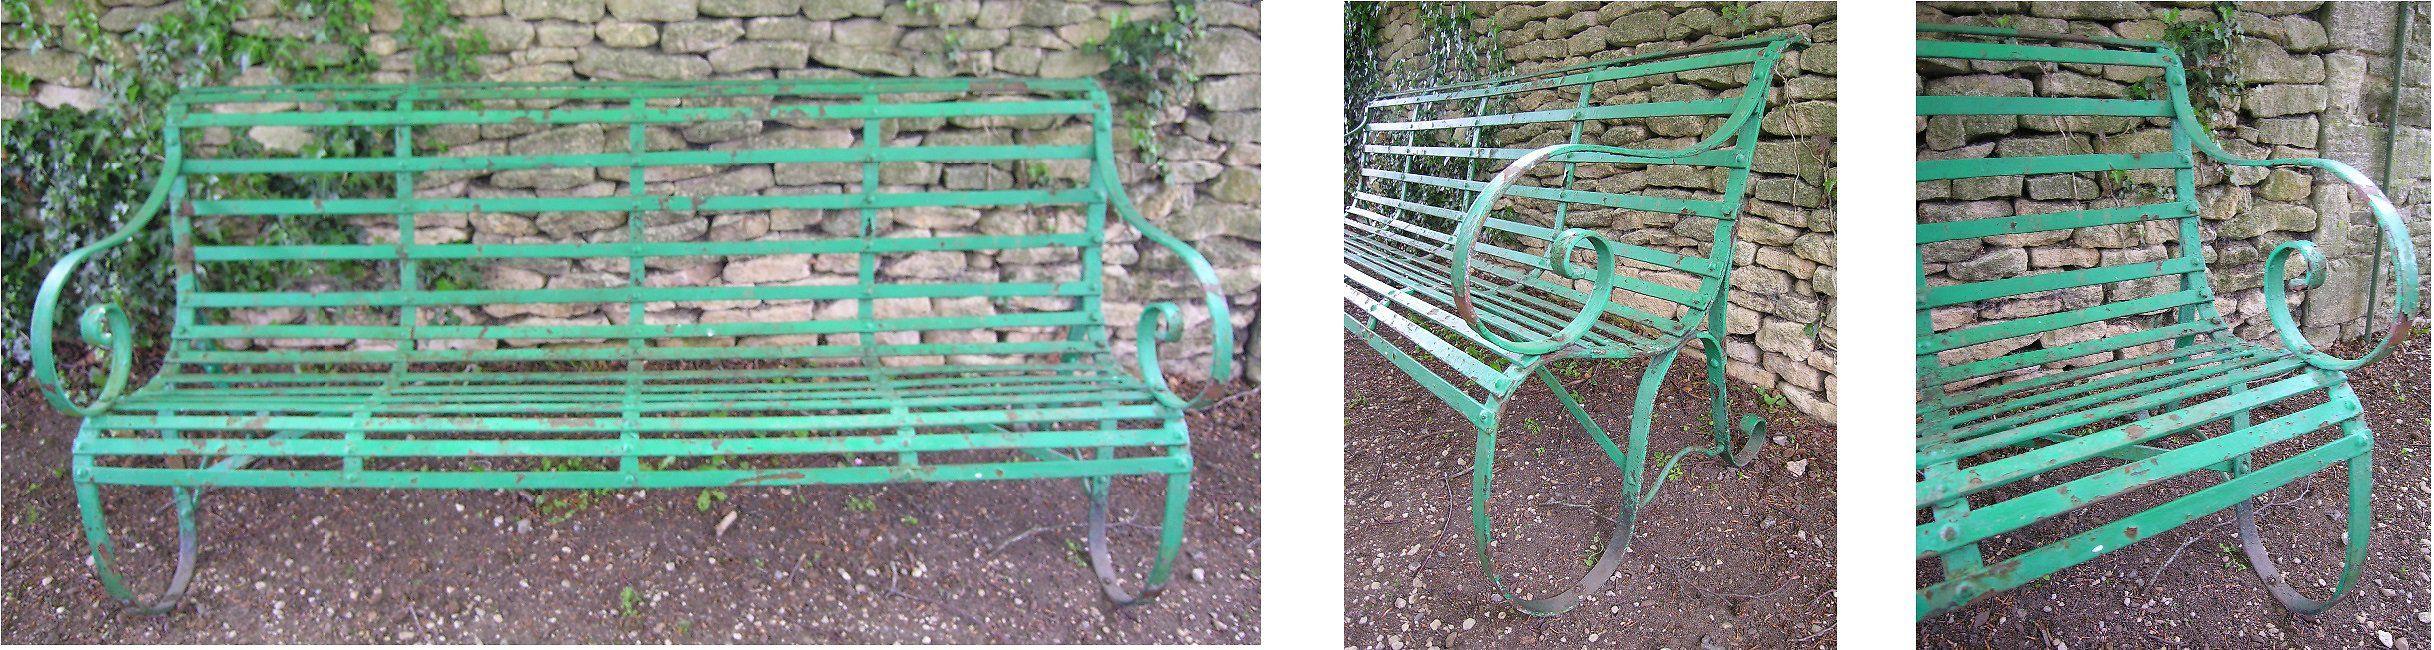 Mid 19th Century Victorian wrought Iron strap work Garden Bench HUTCHISONANTIQUES.COM